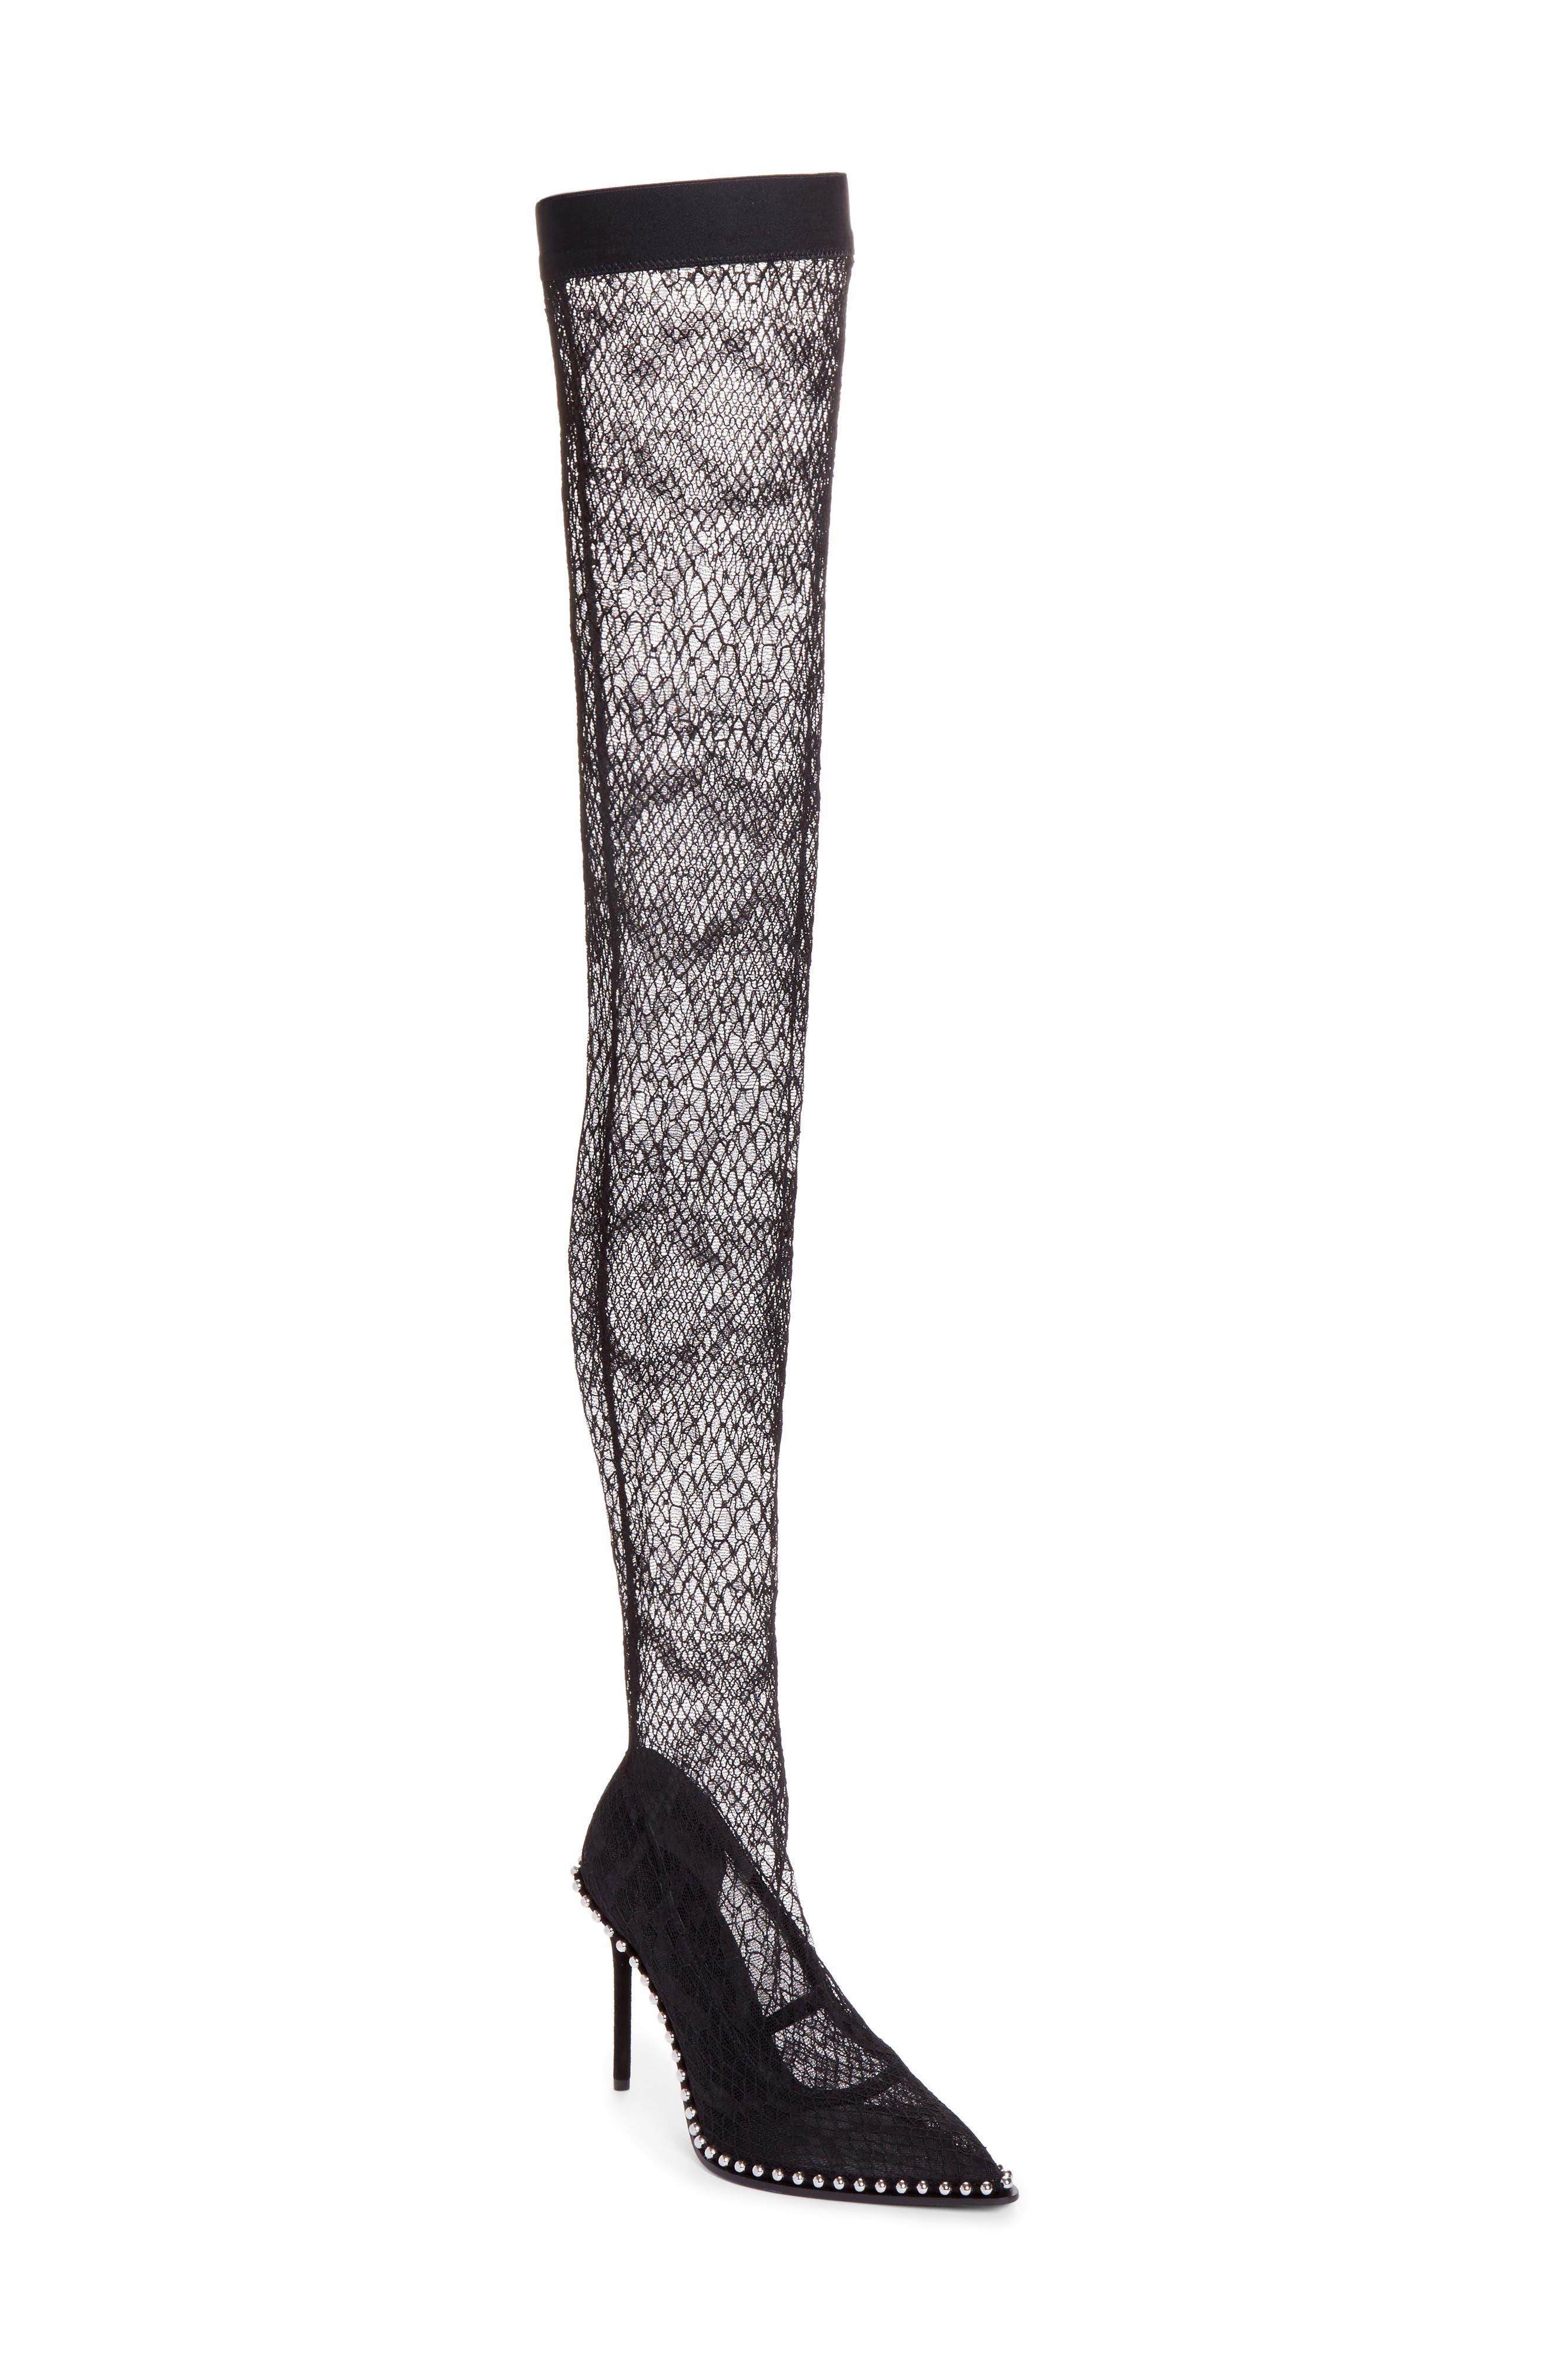 Lyra Thigh-High Fishnet Stocking Pump,                         Main,                         color, 001